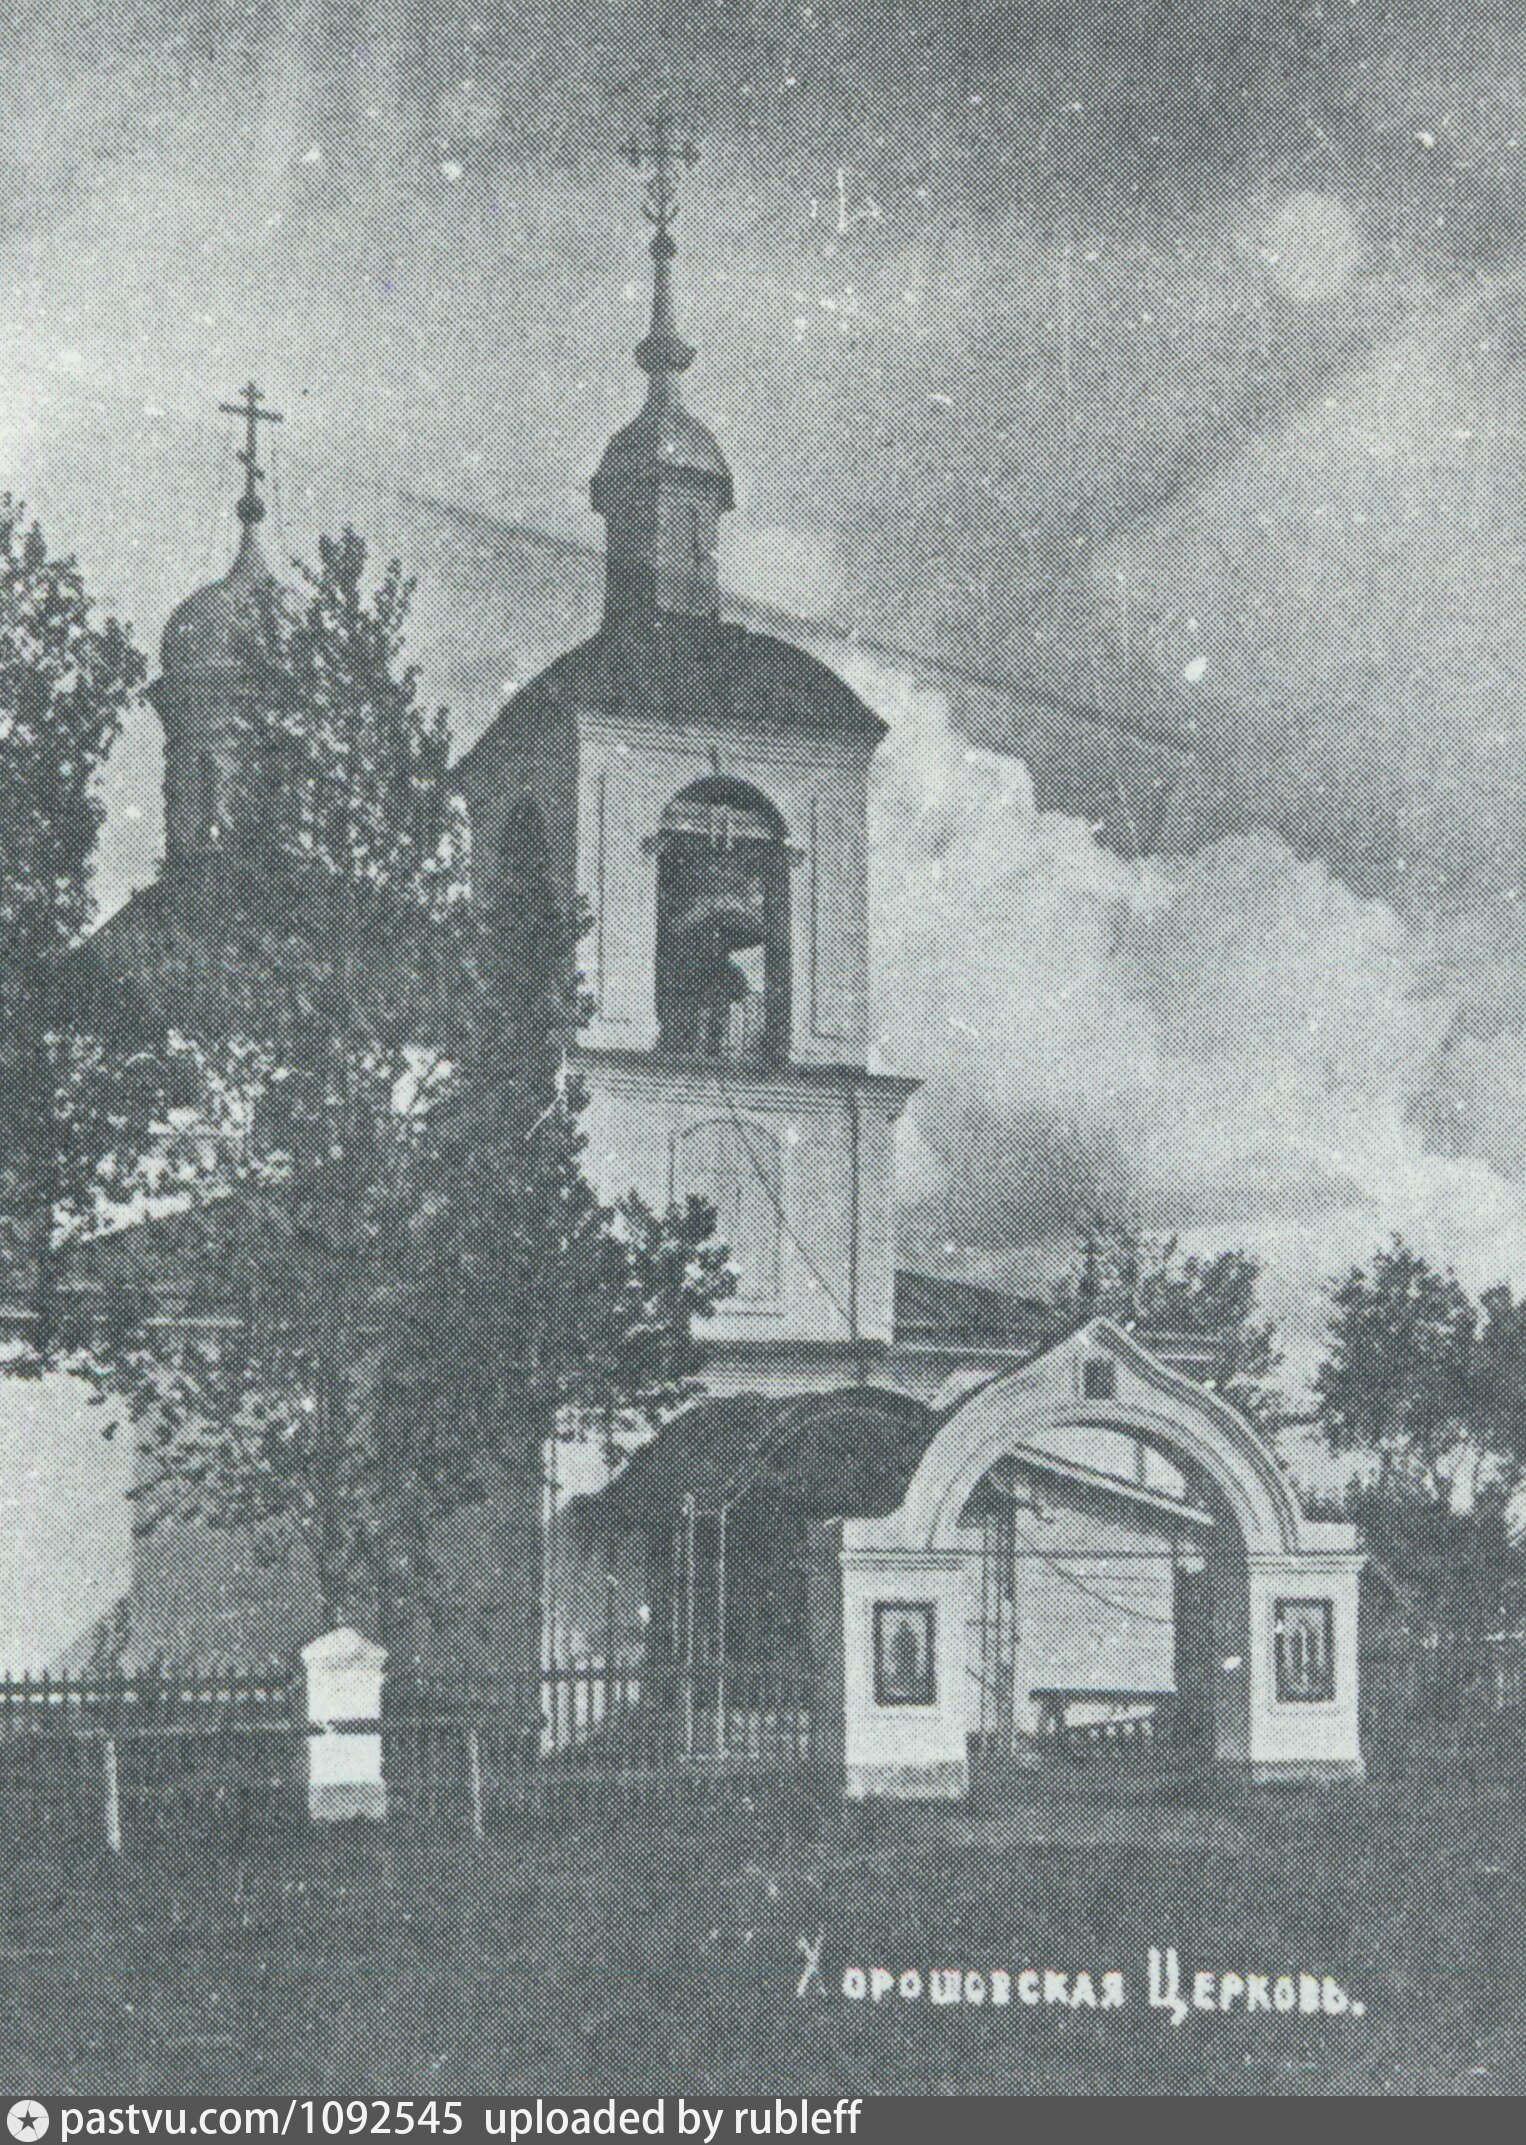 Фото 1900 – 1920 годов.